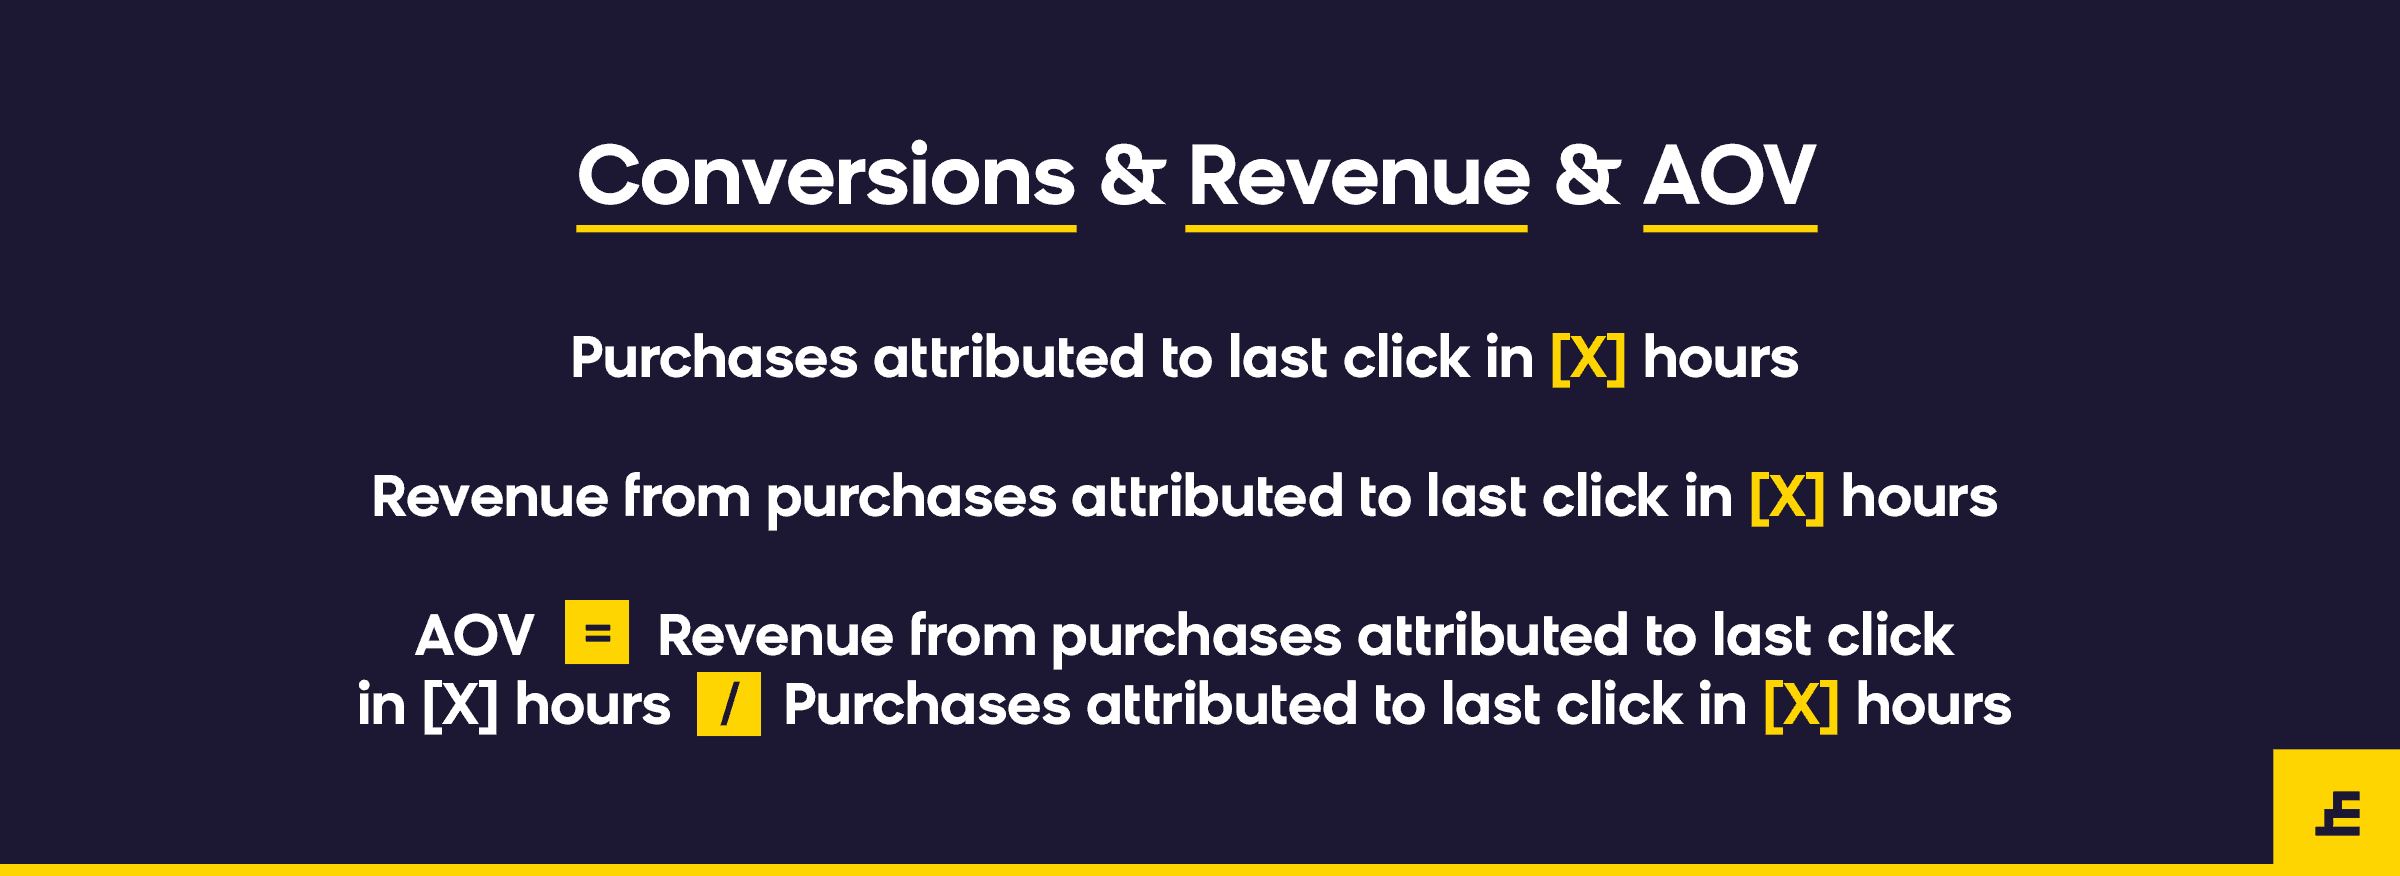 email marketing metric - conversion revenue aov